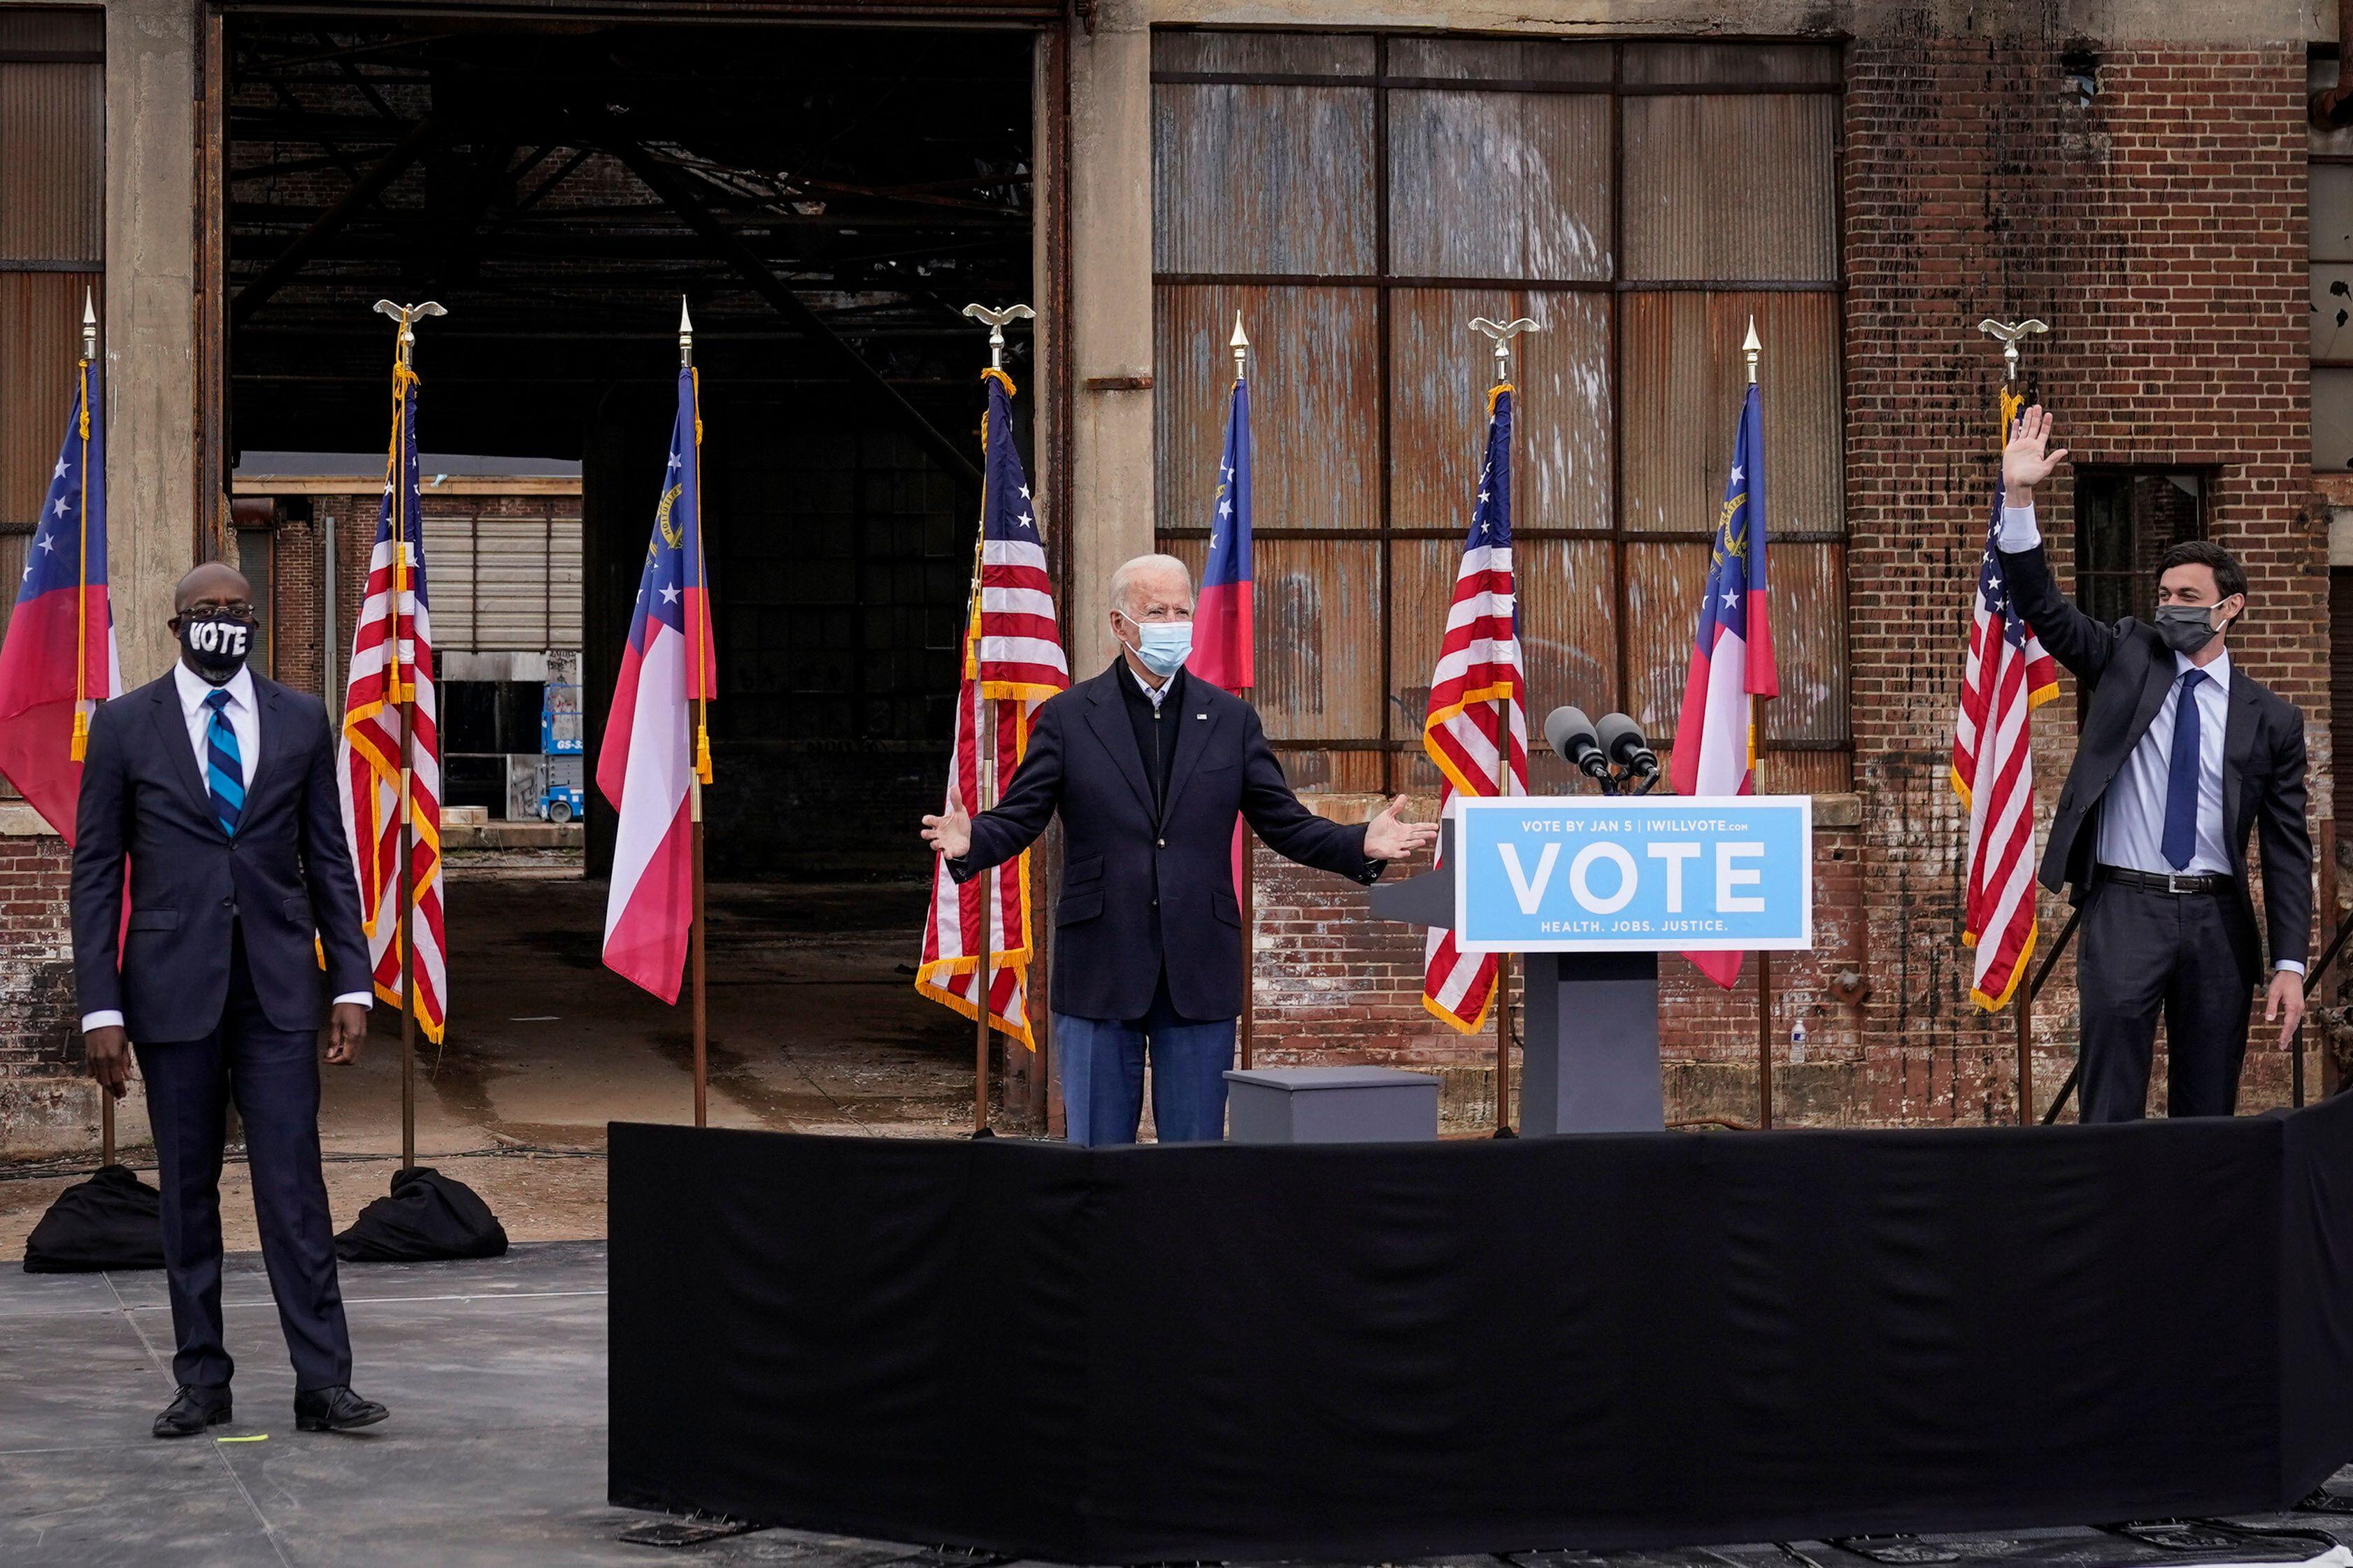 Flanked by U.S. Democratic Senate candidates Rev. Raphael Warnock (left) and Jon Ossoff (right), President-elect Joe Biden ge